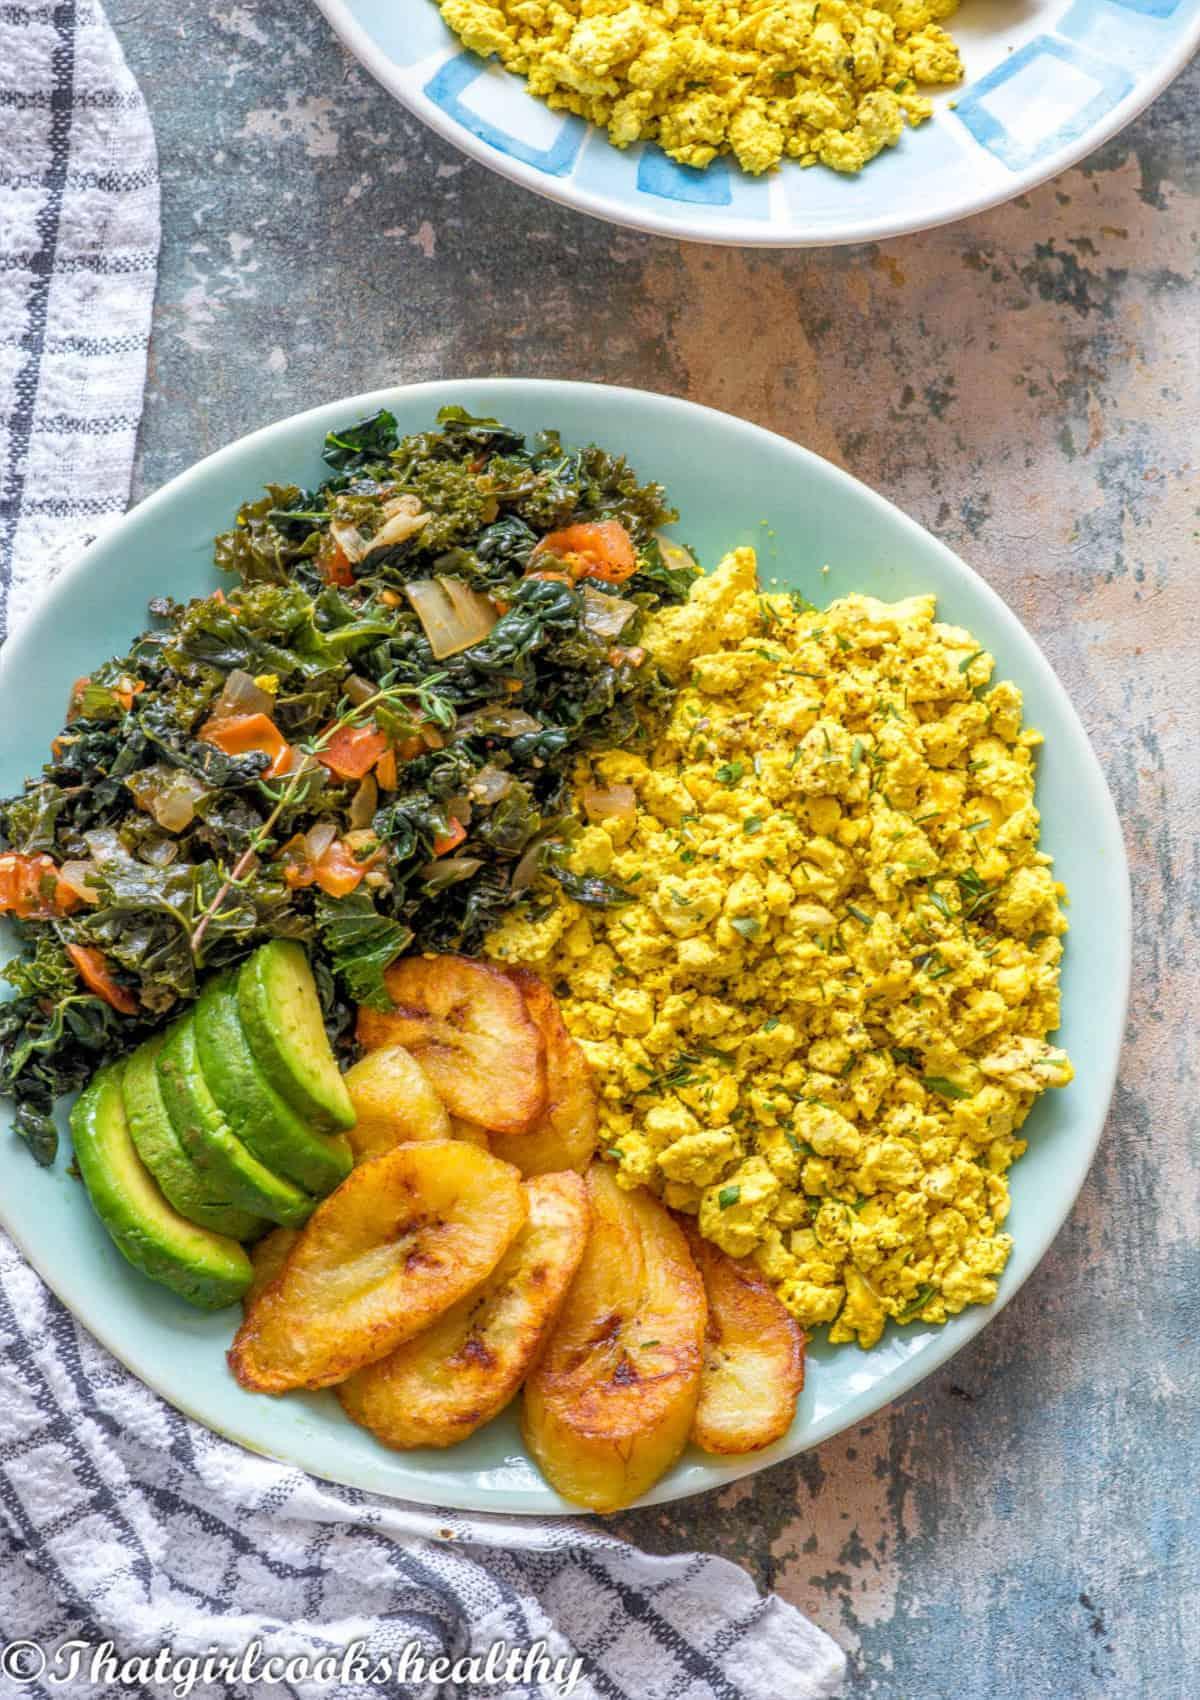 plate of scrambled tofu, plantain, avocado and greens